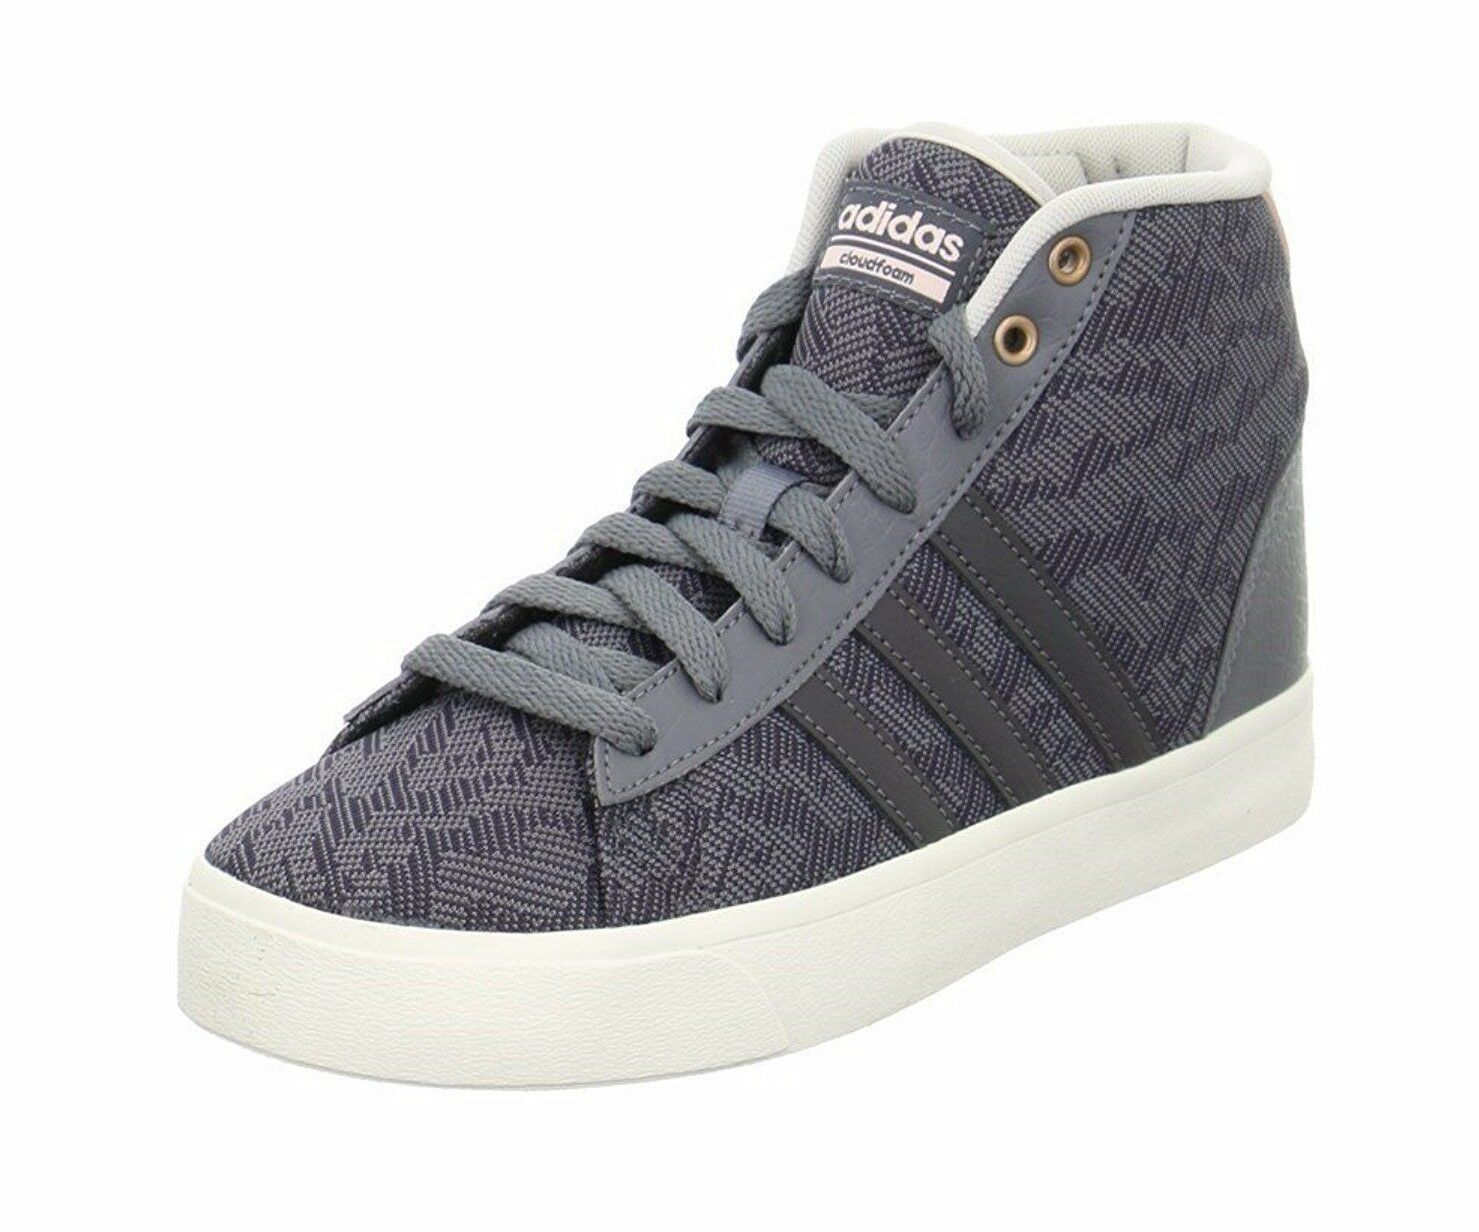 Adidas NEO Damens Schuhes Cloudfoam Fashion Daily QT Mid Casual Fashion Cloudfoam B74276 New 2018 c9727f